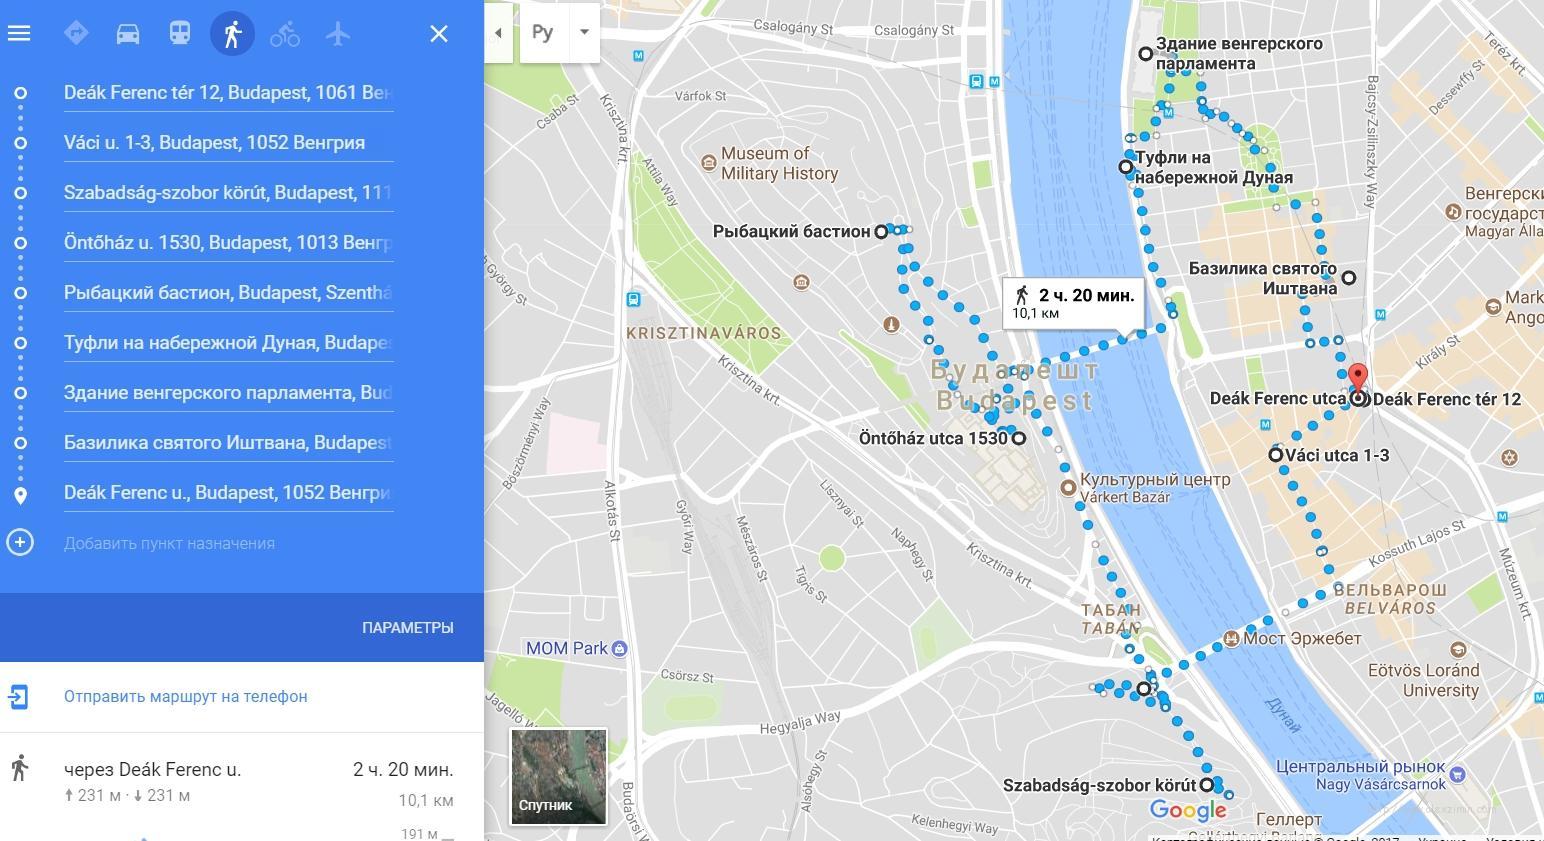 Будапешт. Пешеходный маршрут